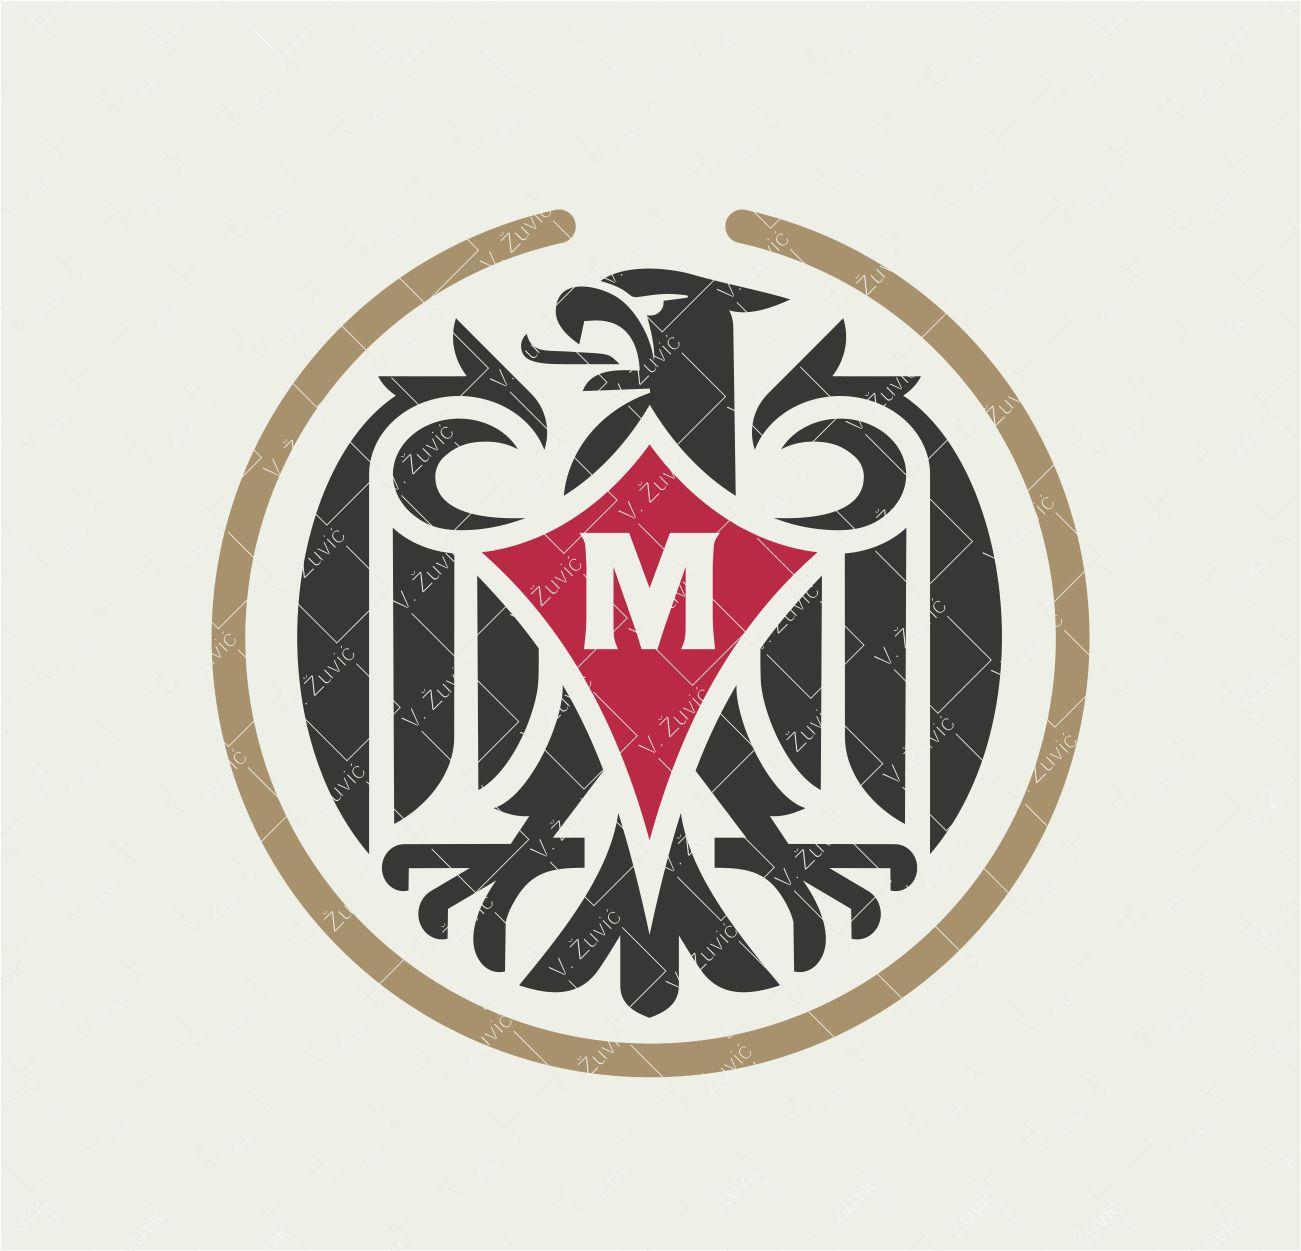 Logo is available for sale. Heraldic eagle logo design in the circle with initial letter M. It is possible to change the letter in the shield.   Logotip je dostupan za prodaju. Dizajn logotipa - heraldički orao u krugu s inicijalnim slovom M. Prema želji klijenta, moguće je promijeniti inicijalno slovu u štitu.